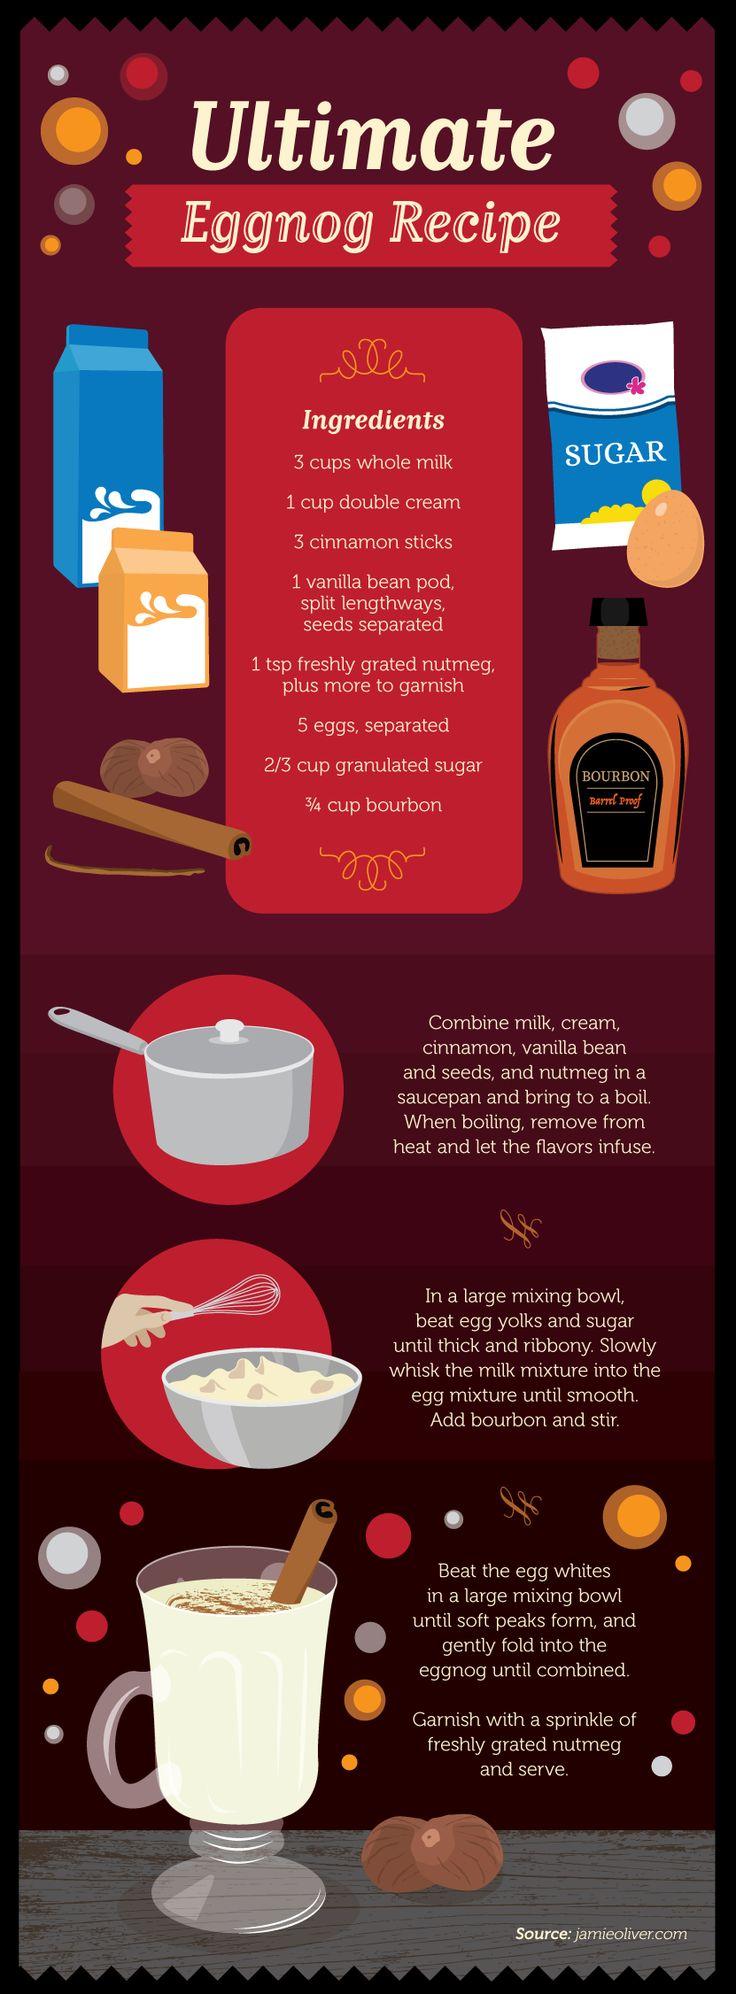 Ultimate Eggnog Recipe - Irresistible Eggnog Recipes for the Holidays